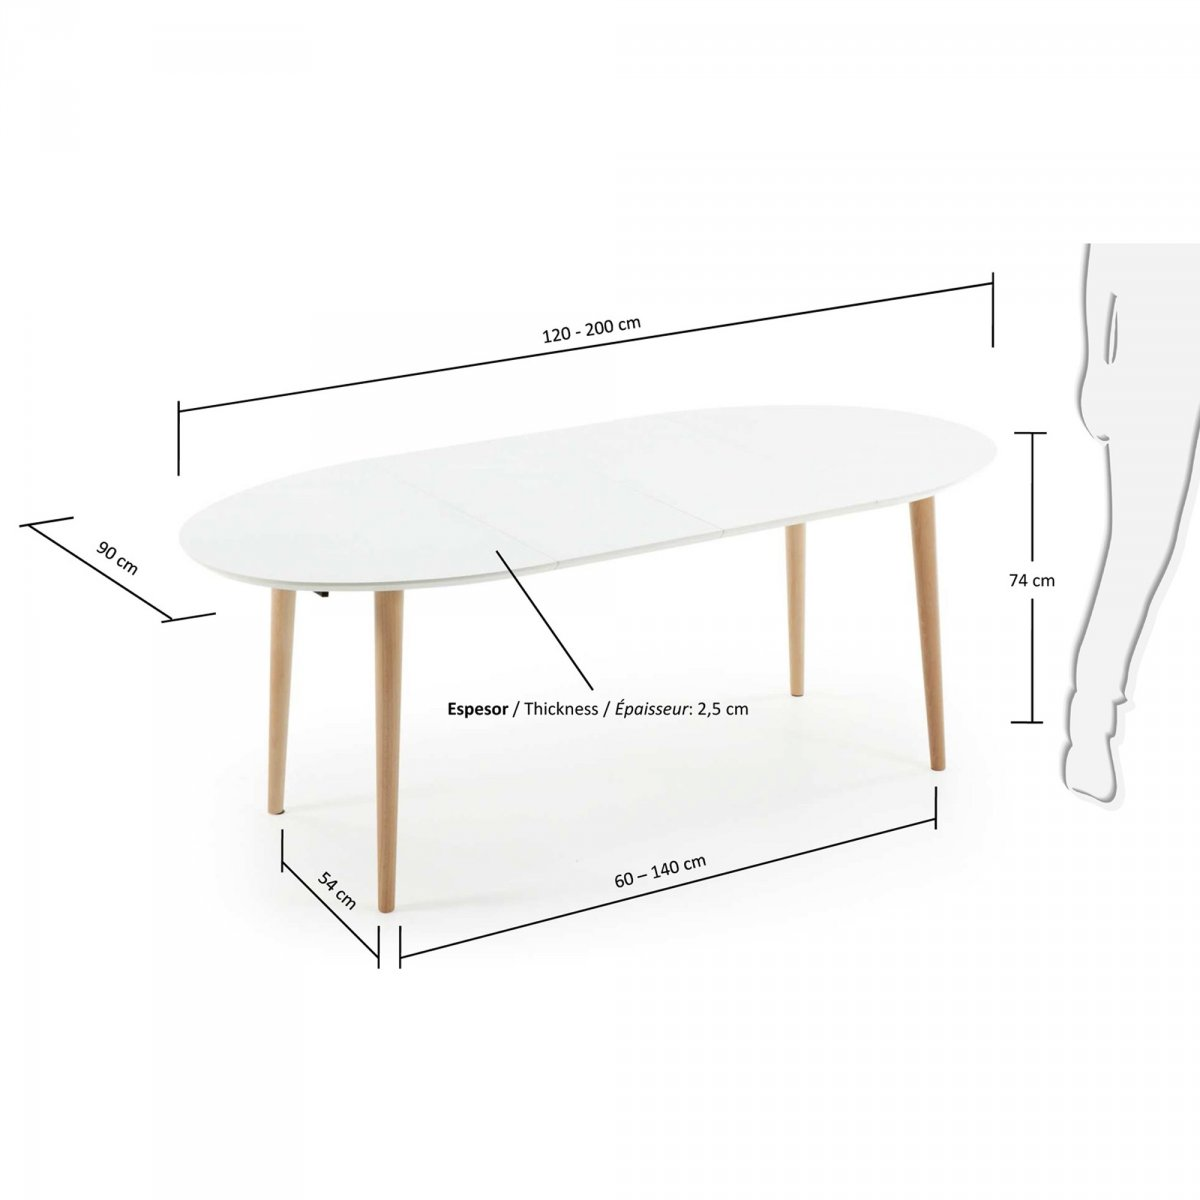 Keihome Linea J Tavolo OQUI allungabile Ovale legno 120 x 90